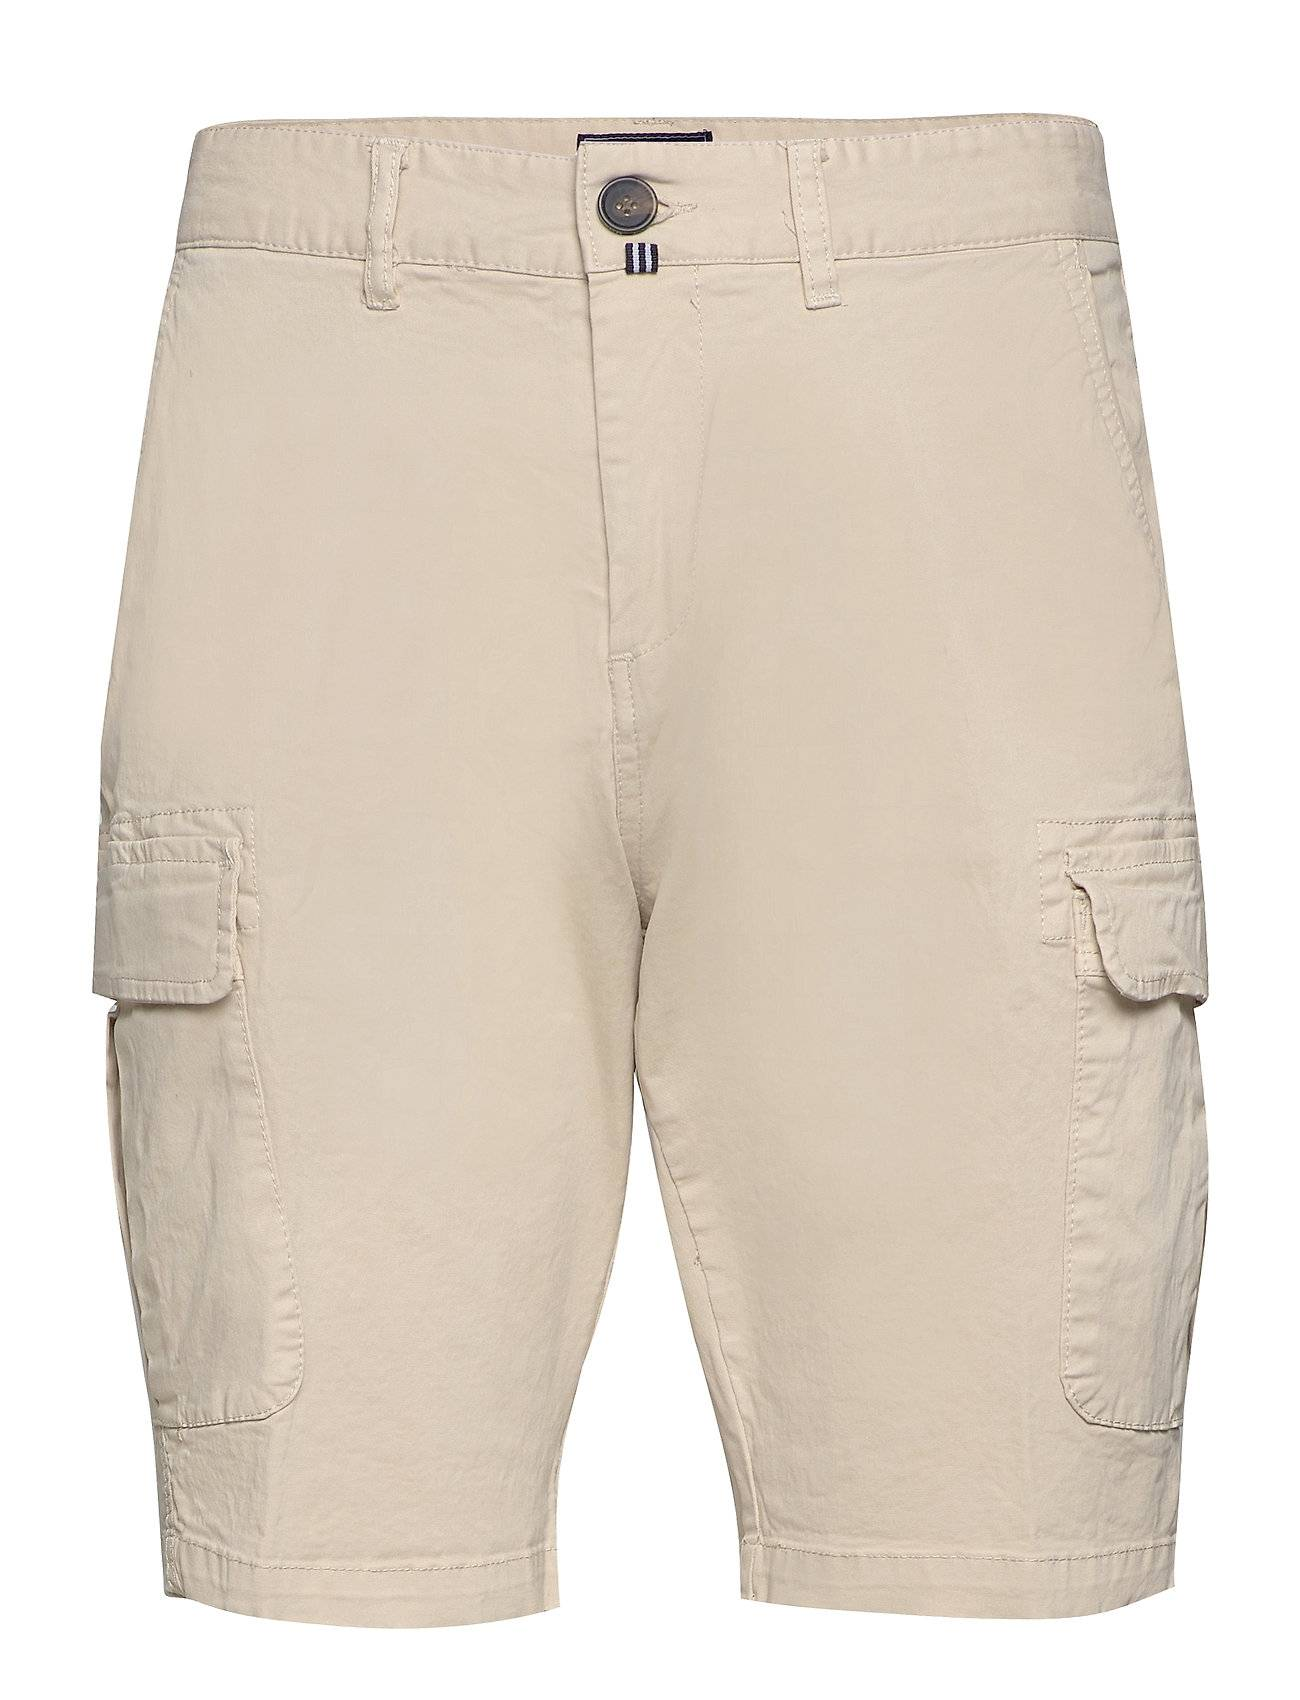 Park Lane 8902-1766 Shorts Cargo Shorts Beige Park Lane